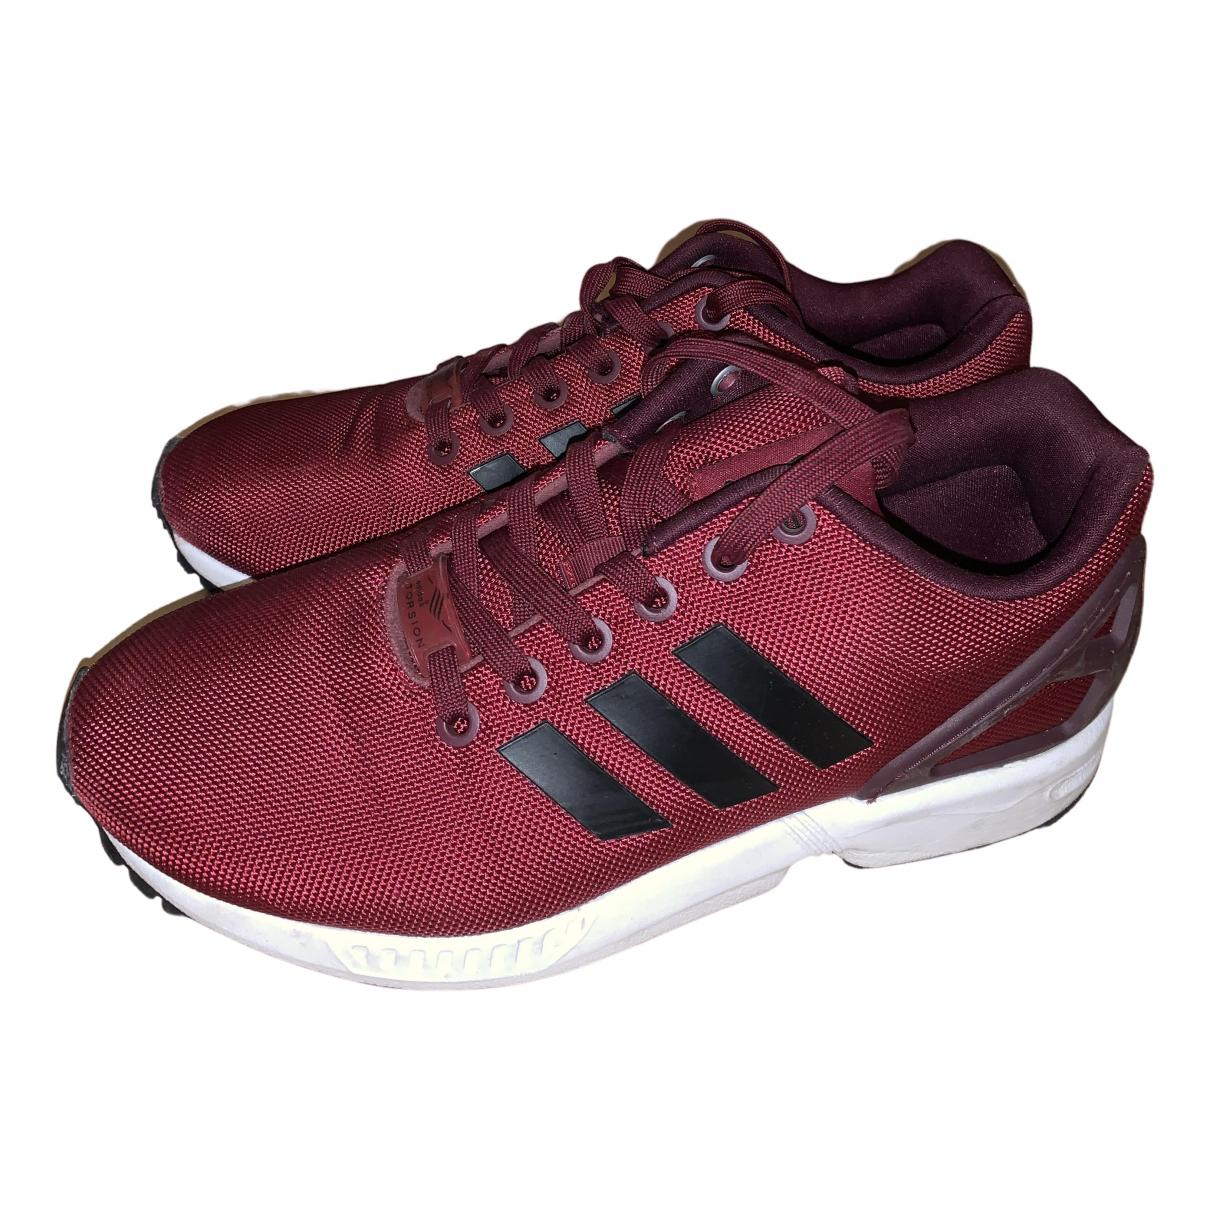 Adidas ZX Sneakers in  Bordeauxrot Kunststoff